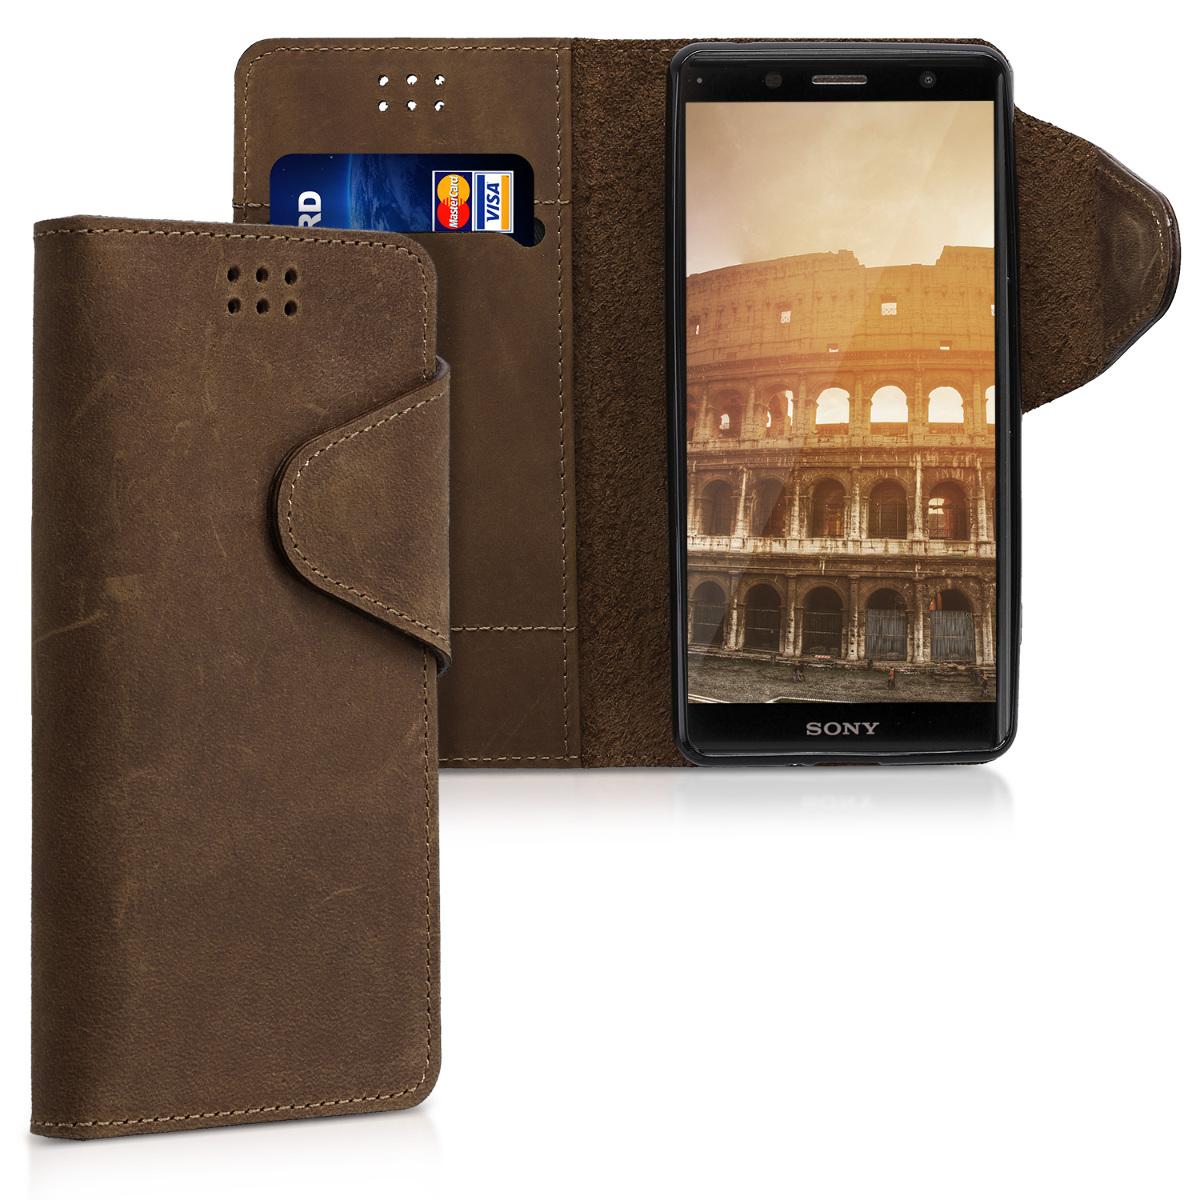 Kalibri Δερμάτινη Suede Θήκη - Πορτοφόλι Sony Xperia XZ2 Compact - Καφέ (44316.05)